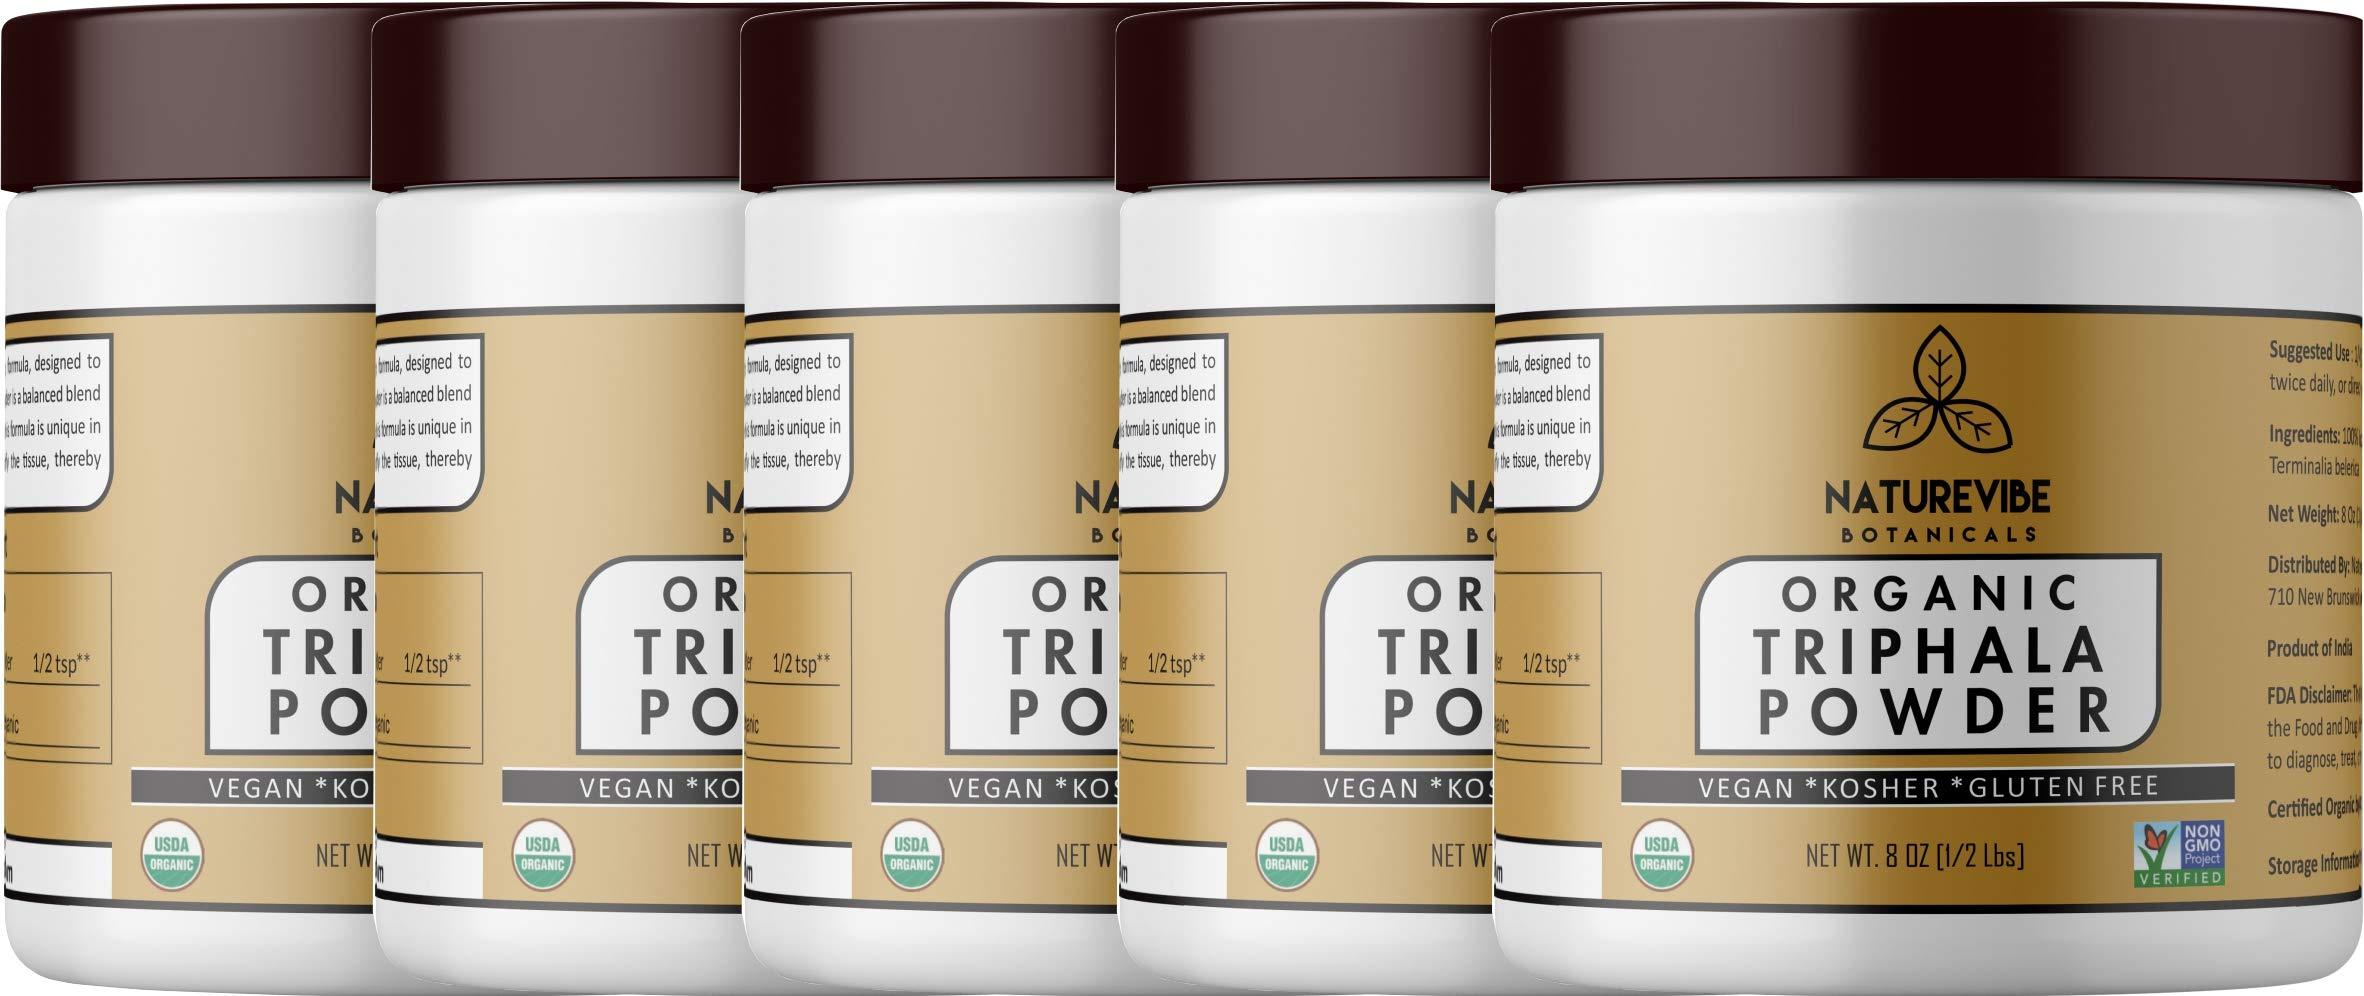 Naturevibe Botanicals USDA Organic Triphala Powder (40oz) (5 Pack of 8oz Each)- Ayurvedic Formula for Detoxification & Rejuvenation - 100% Pure & Natural